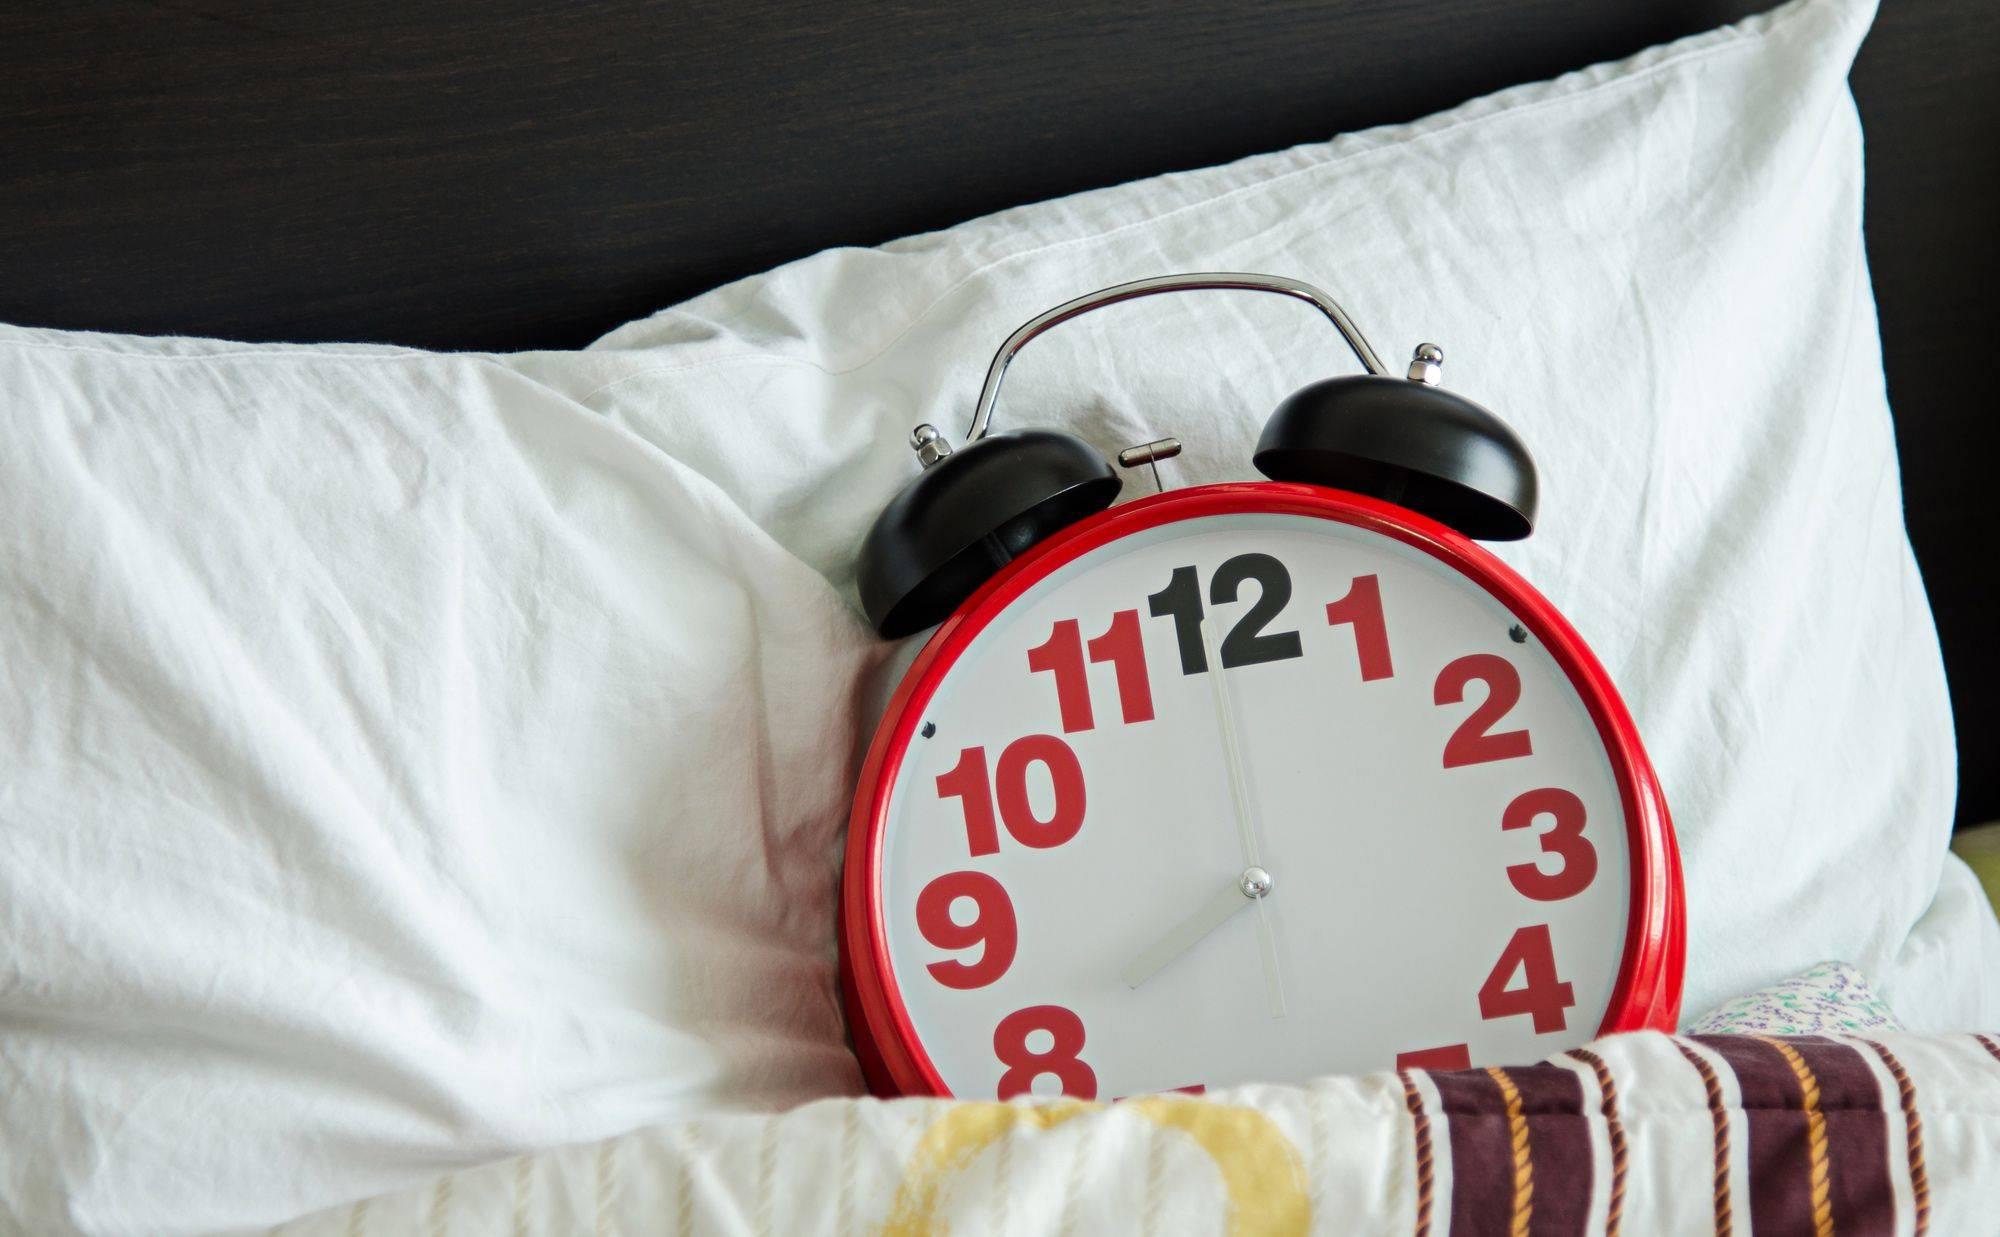 полезные советы чтобы высыпаться - Stone Forest